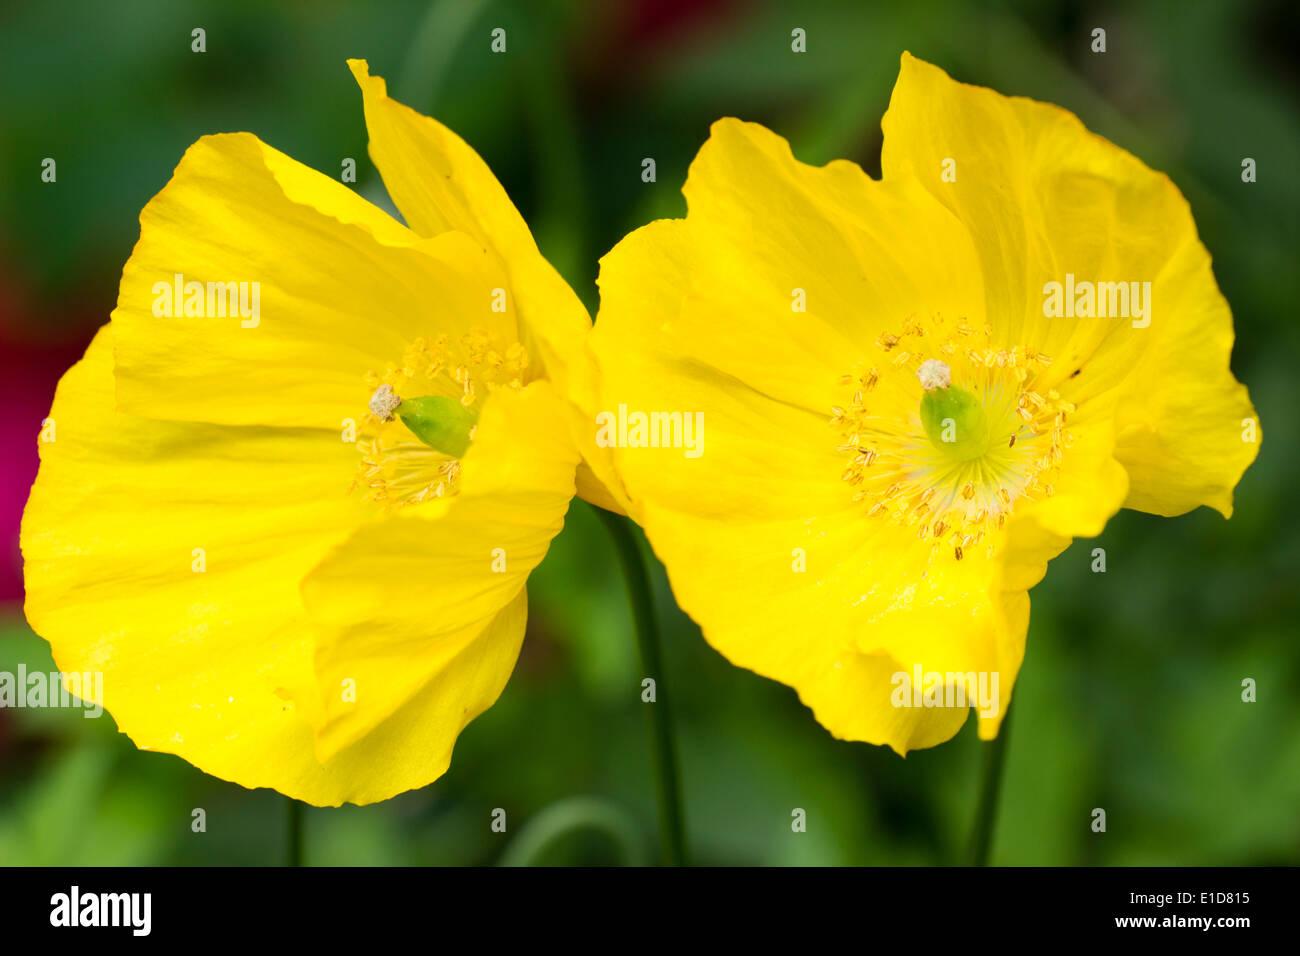 Yellow poppy uk stock photos yellow poppy uk stock images alamy two flowers of the yellow single form of the welsh poppy papaver cambricum stock mightylinksfo